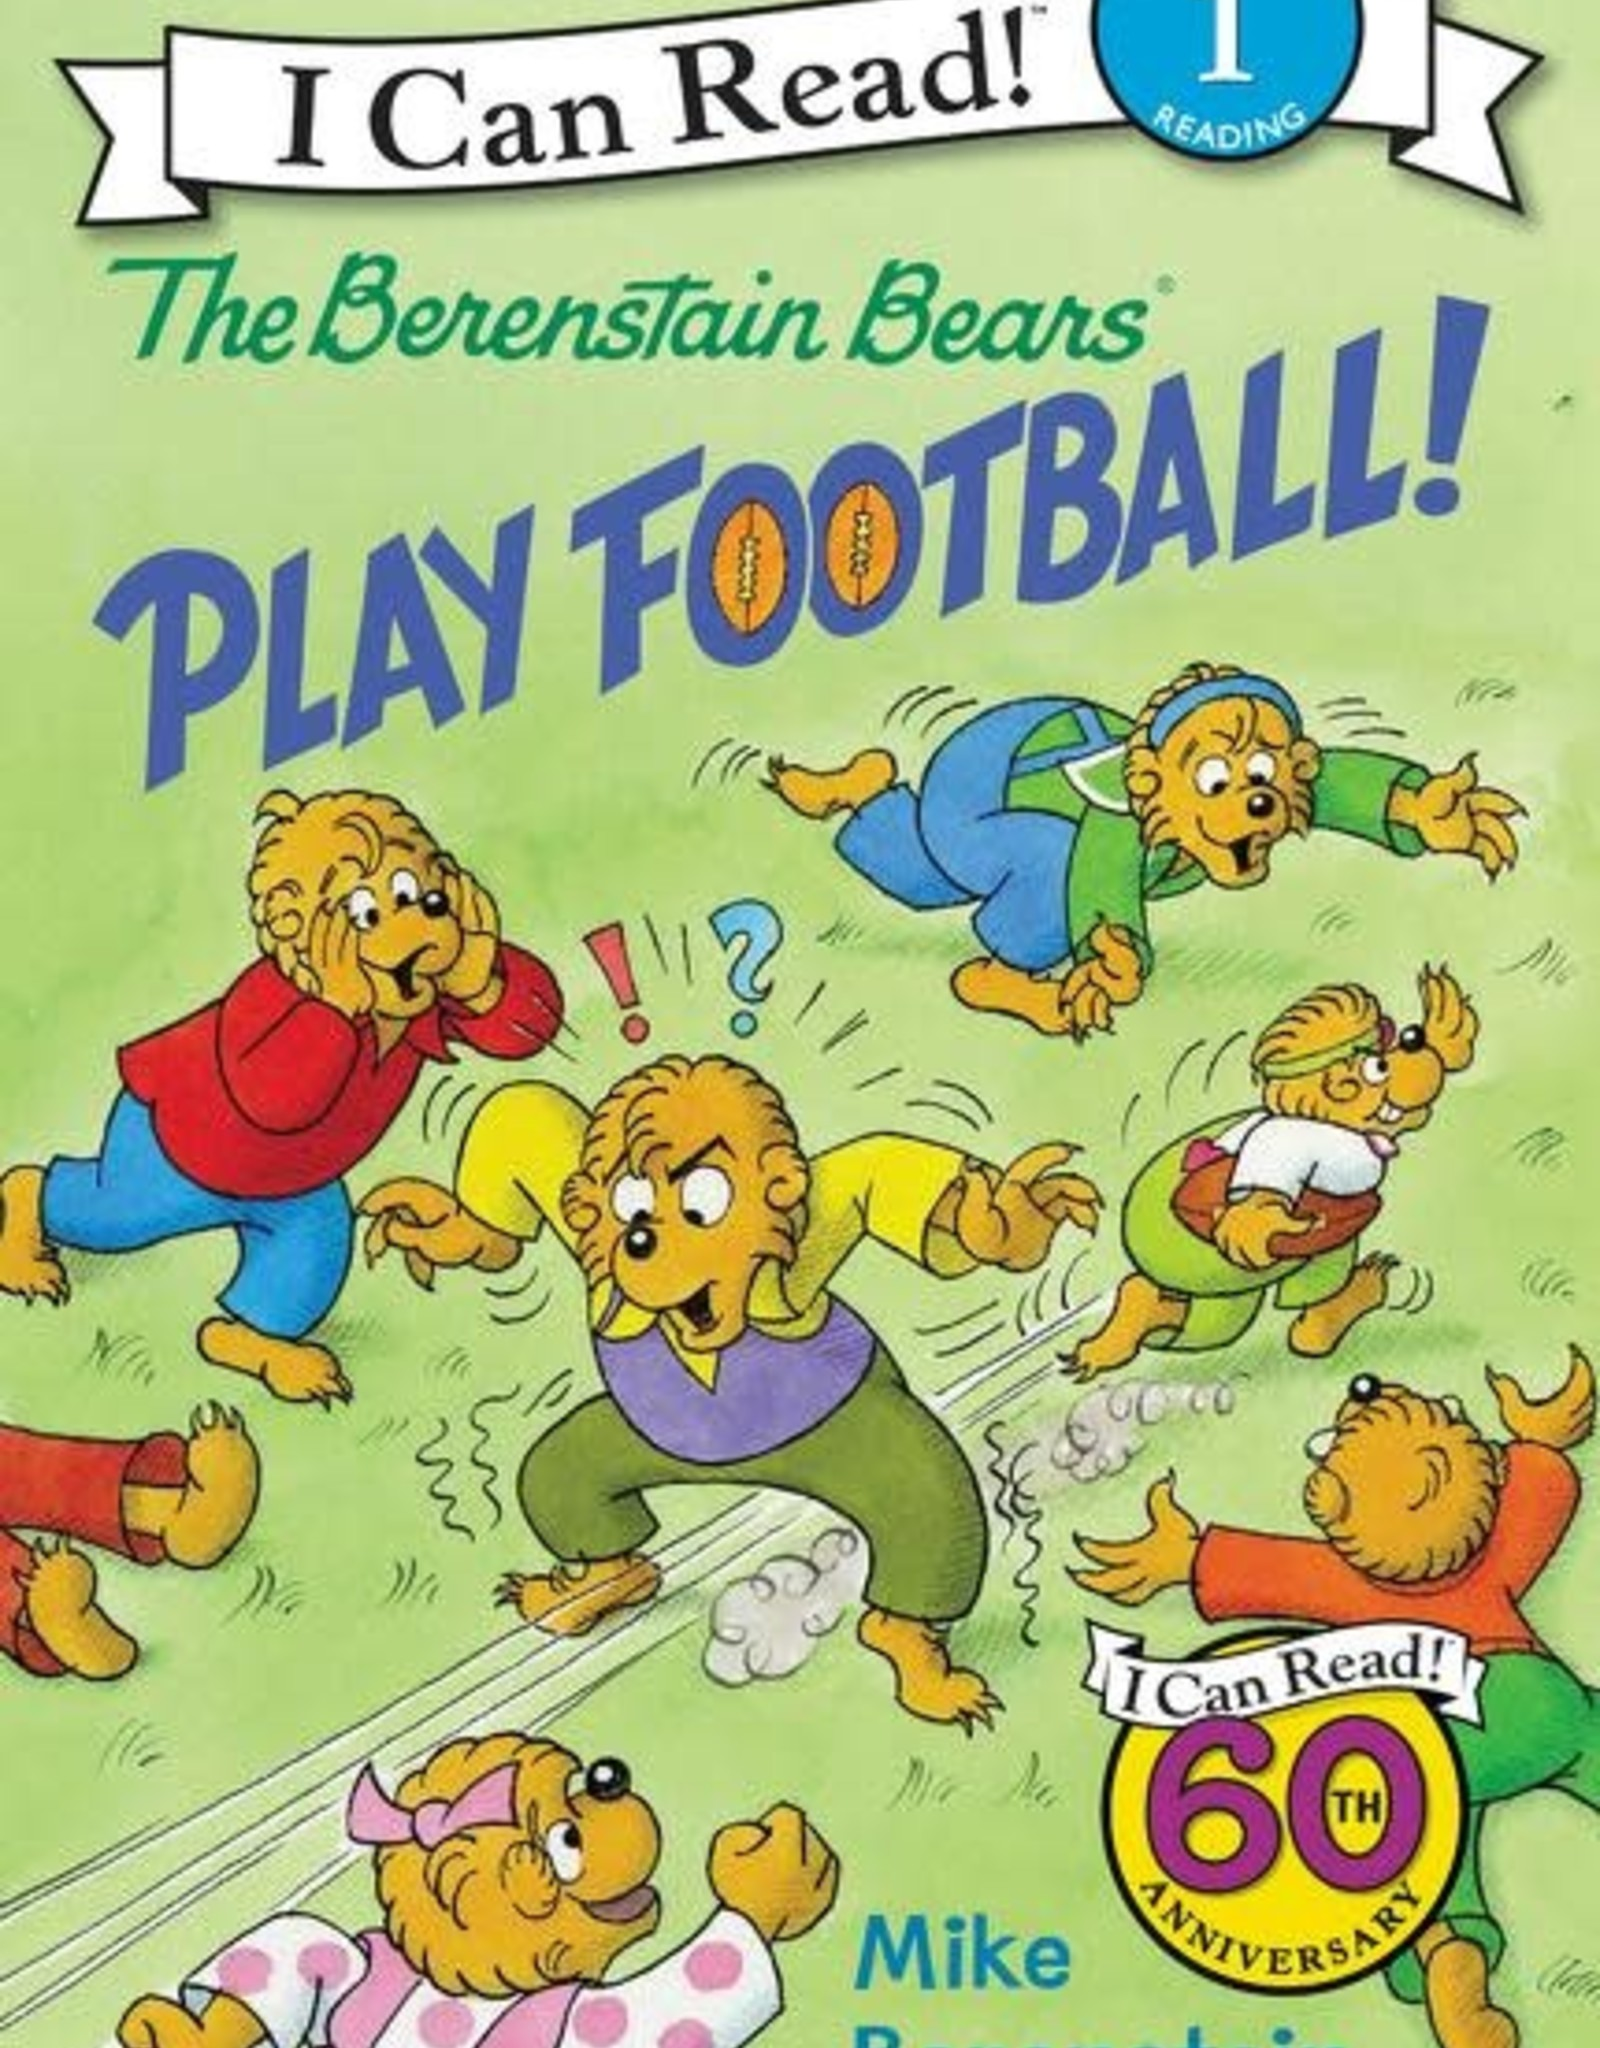 I Can Read! Berenstain Bears Play Football